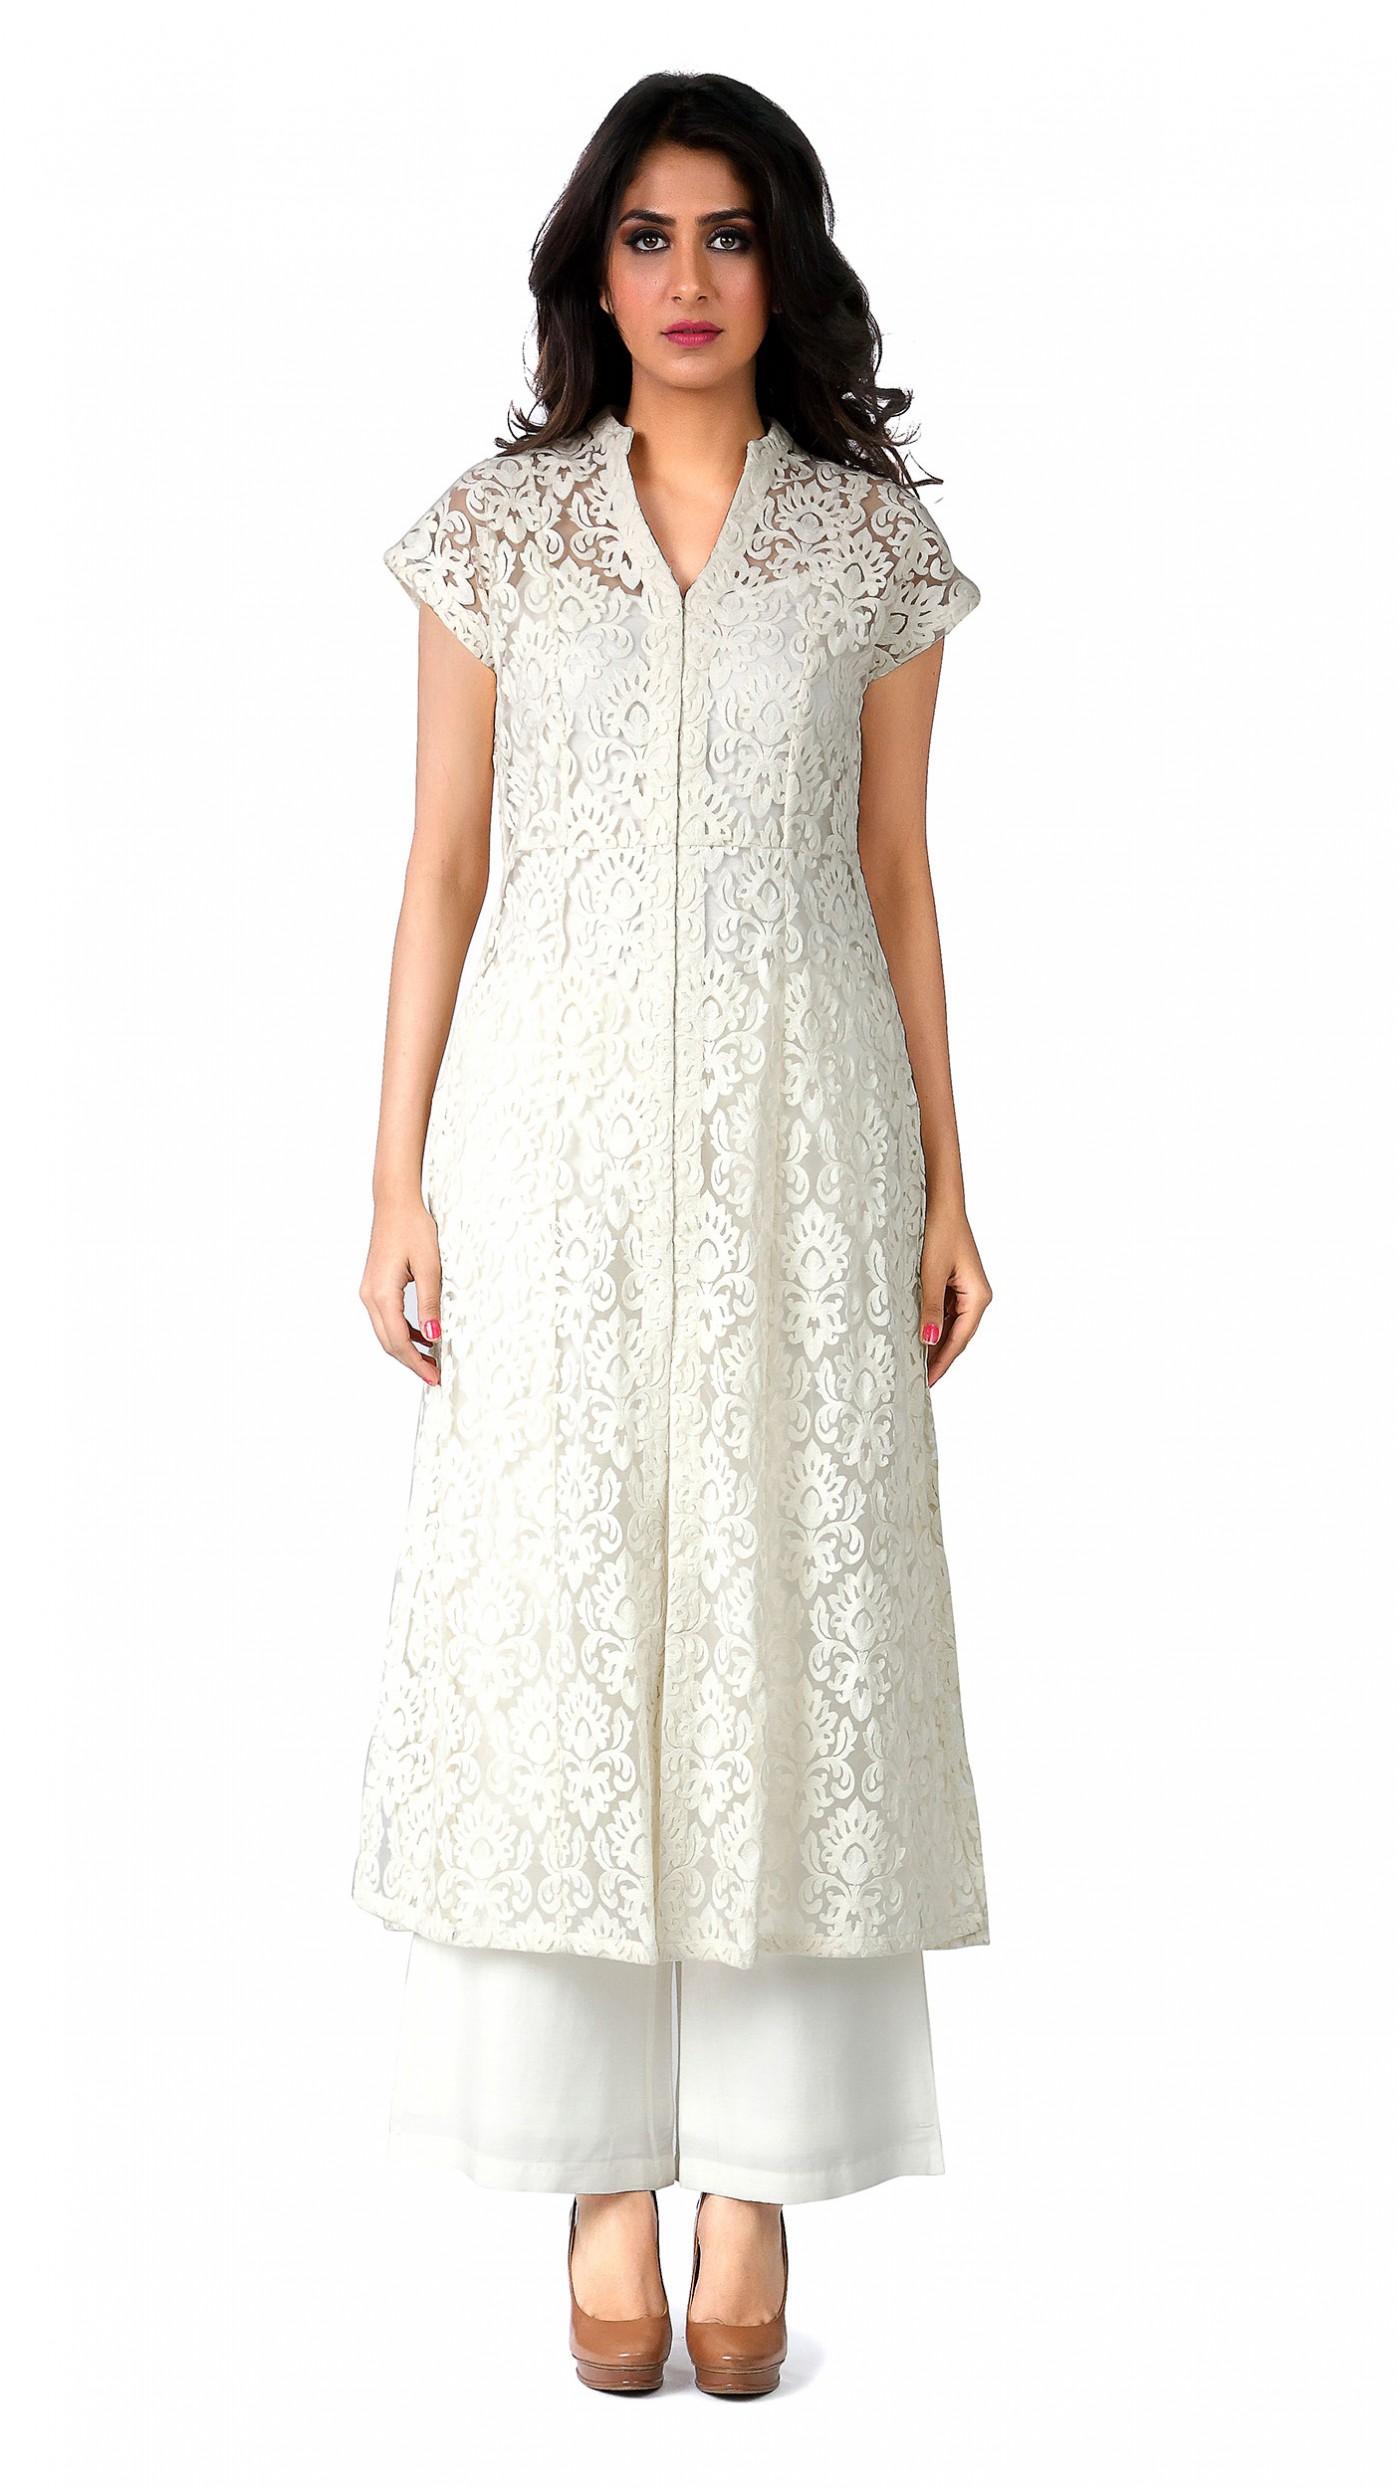 Anita dongre 39 s cream net kurta for Couture fashion designers